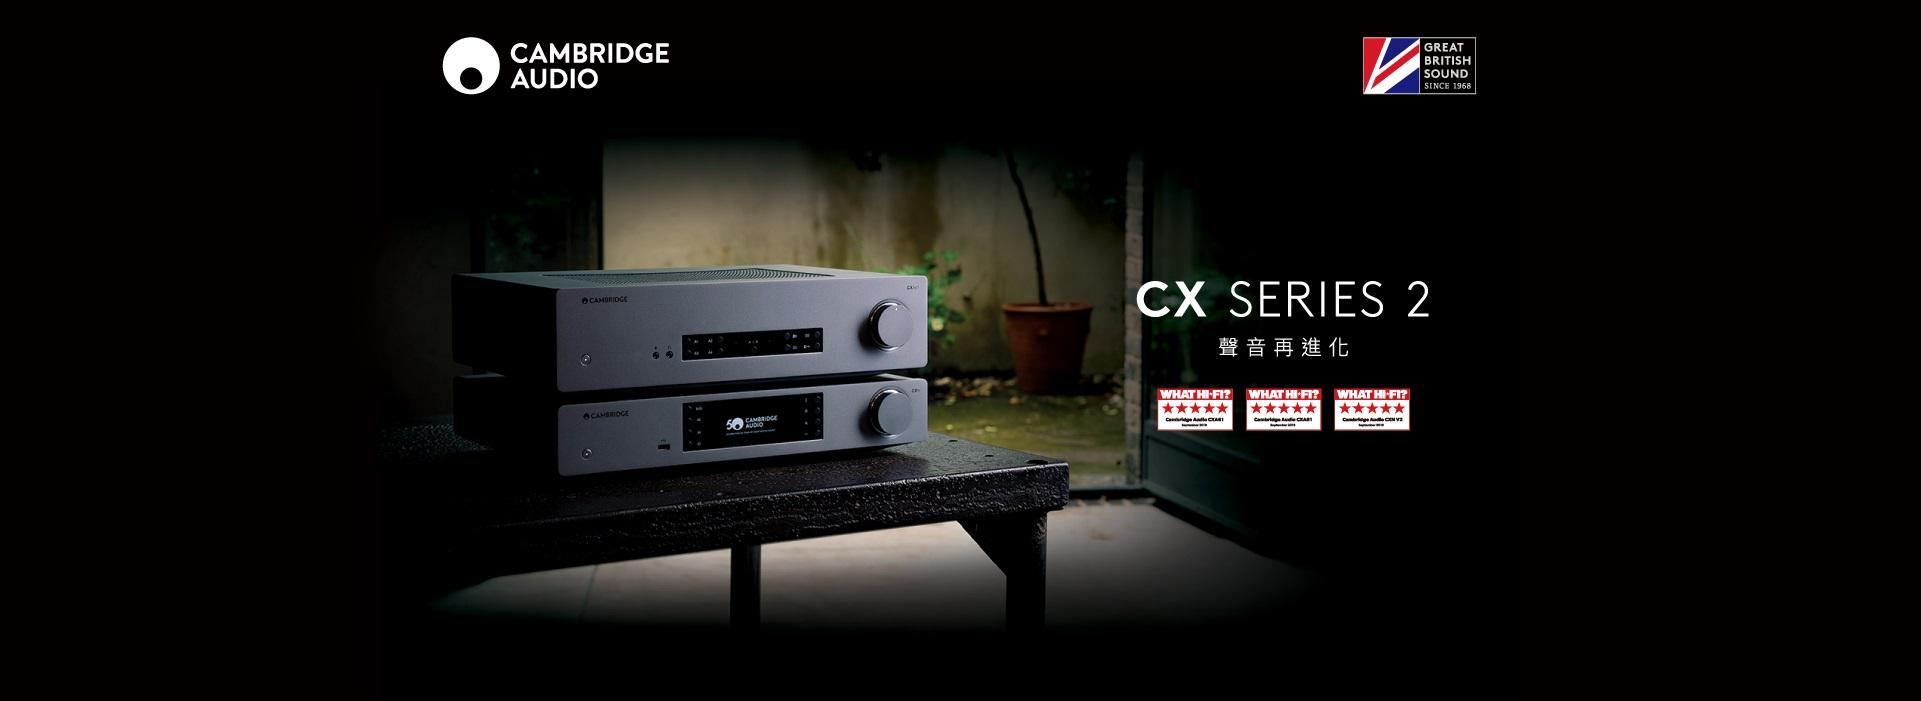 CAMBRIDGE AUDIO CX series V2